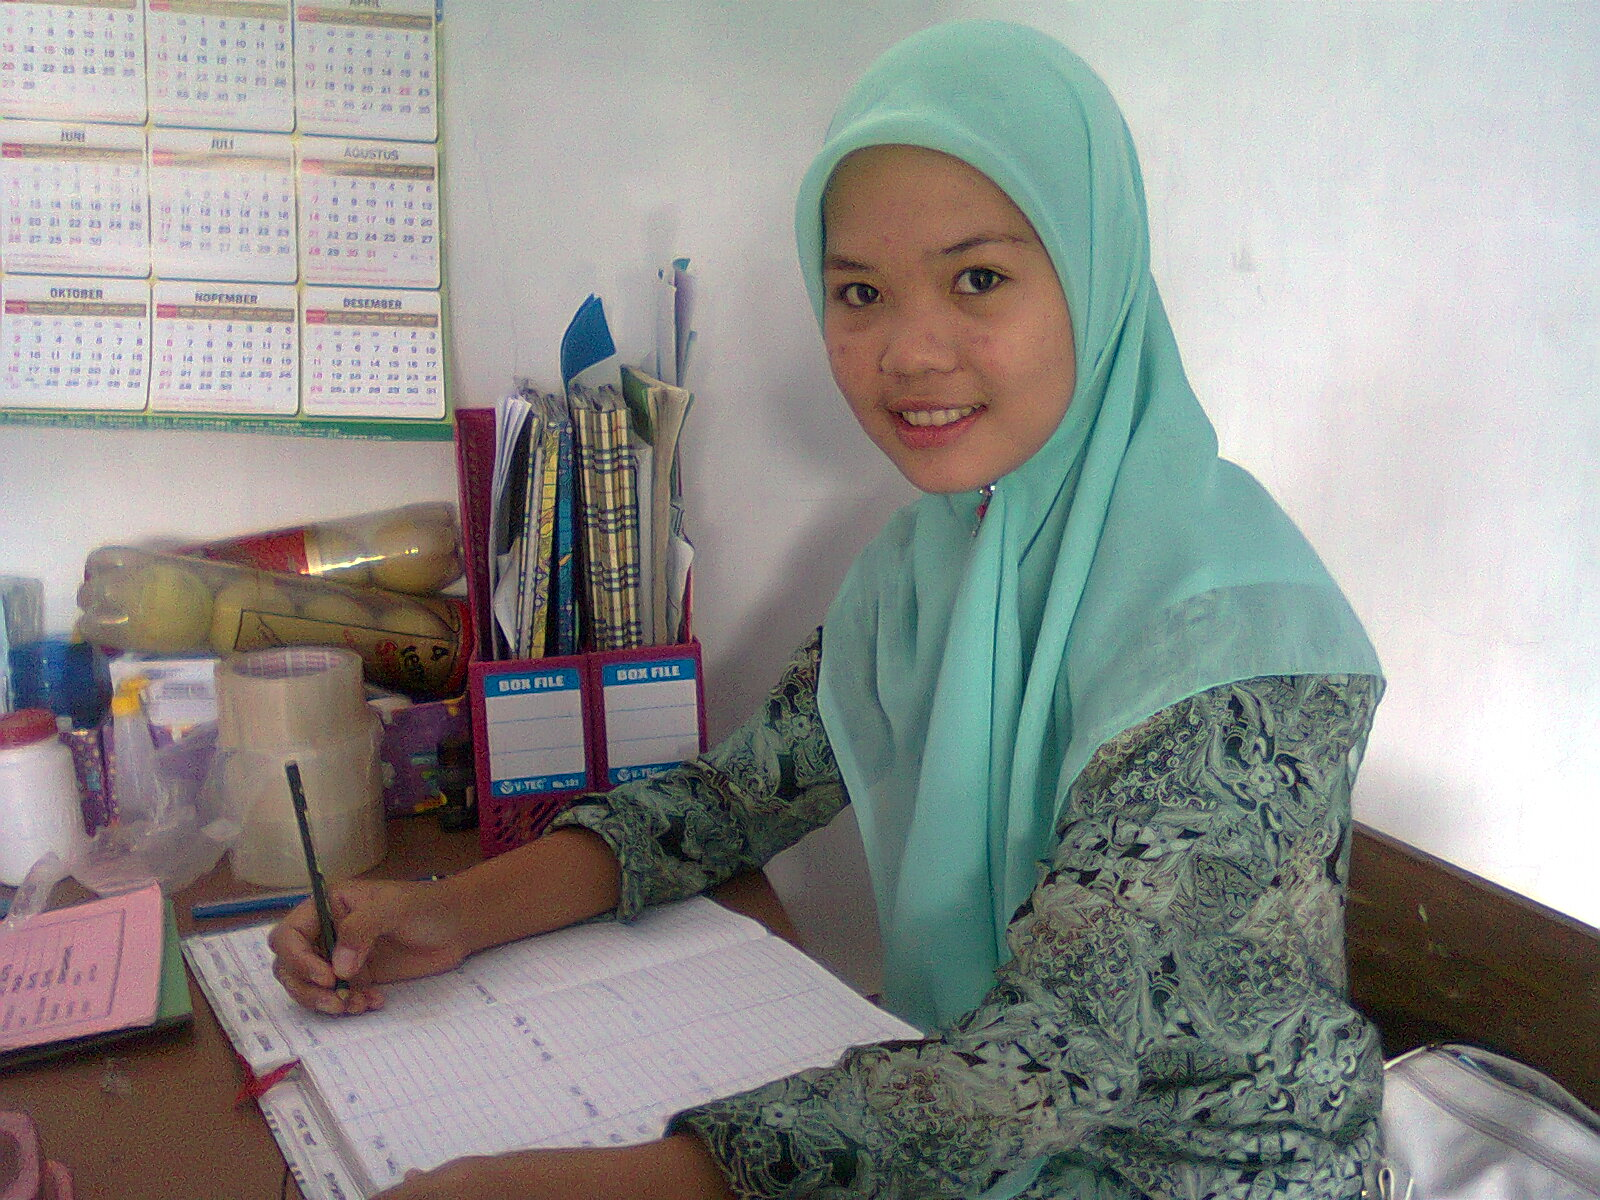 Profil Tenaga Kependidikan Staf Perpustakaan Sd Negeri Seling Uptd Dikpora Kecamatan